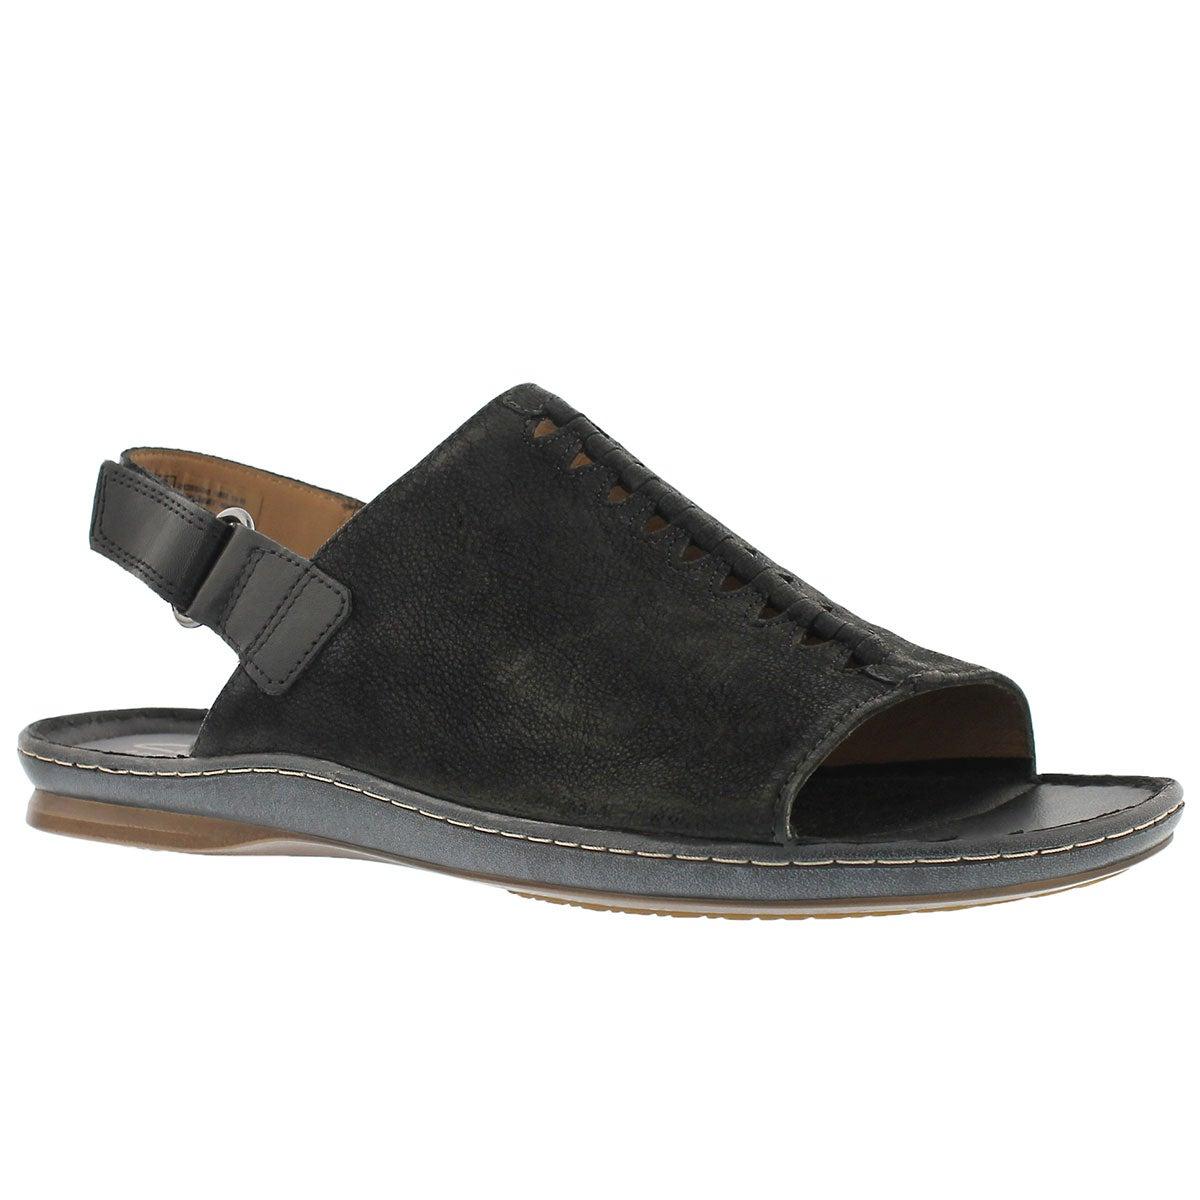 Women's SARLA FORTE black casual sandals